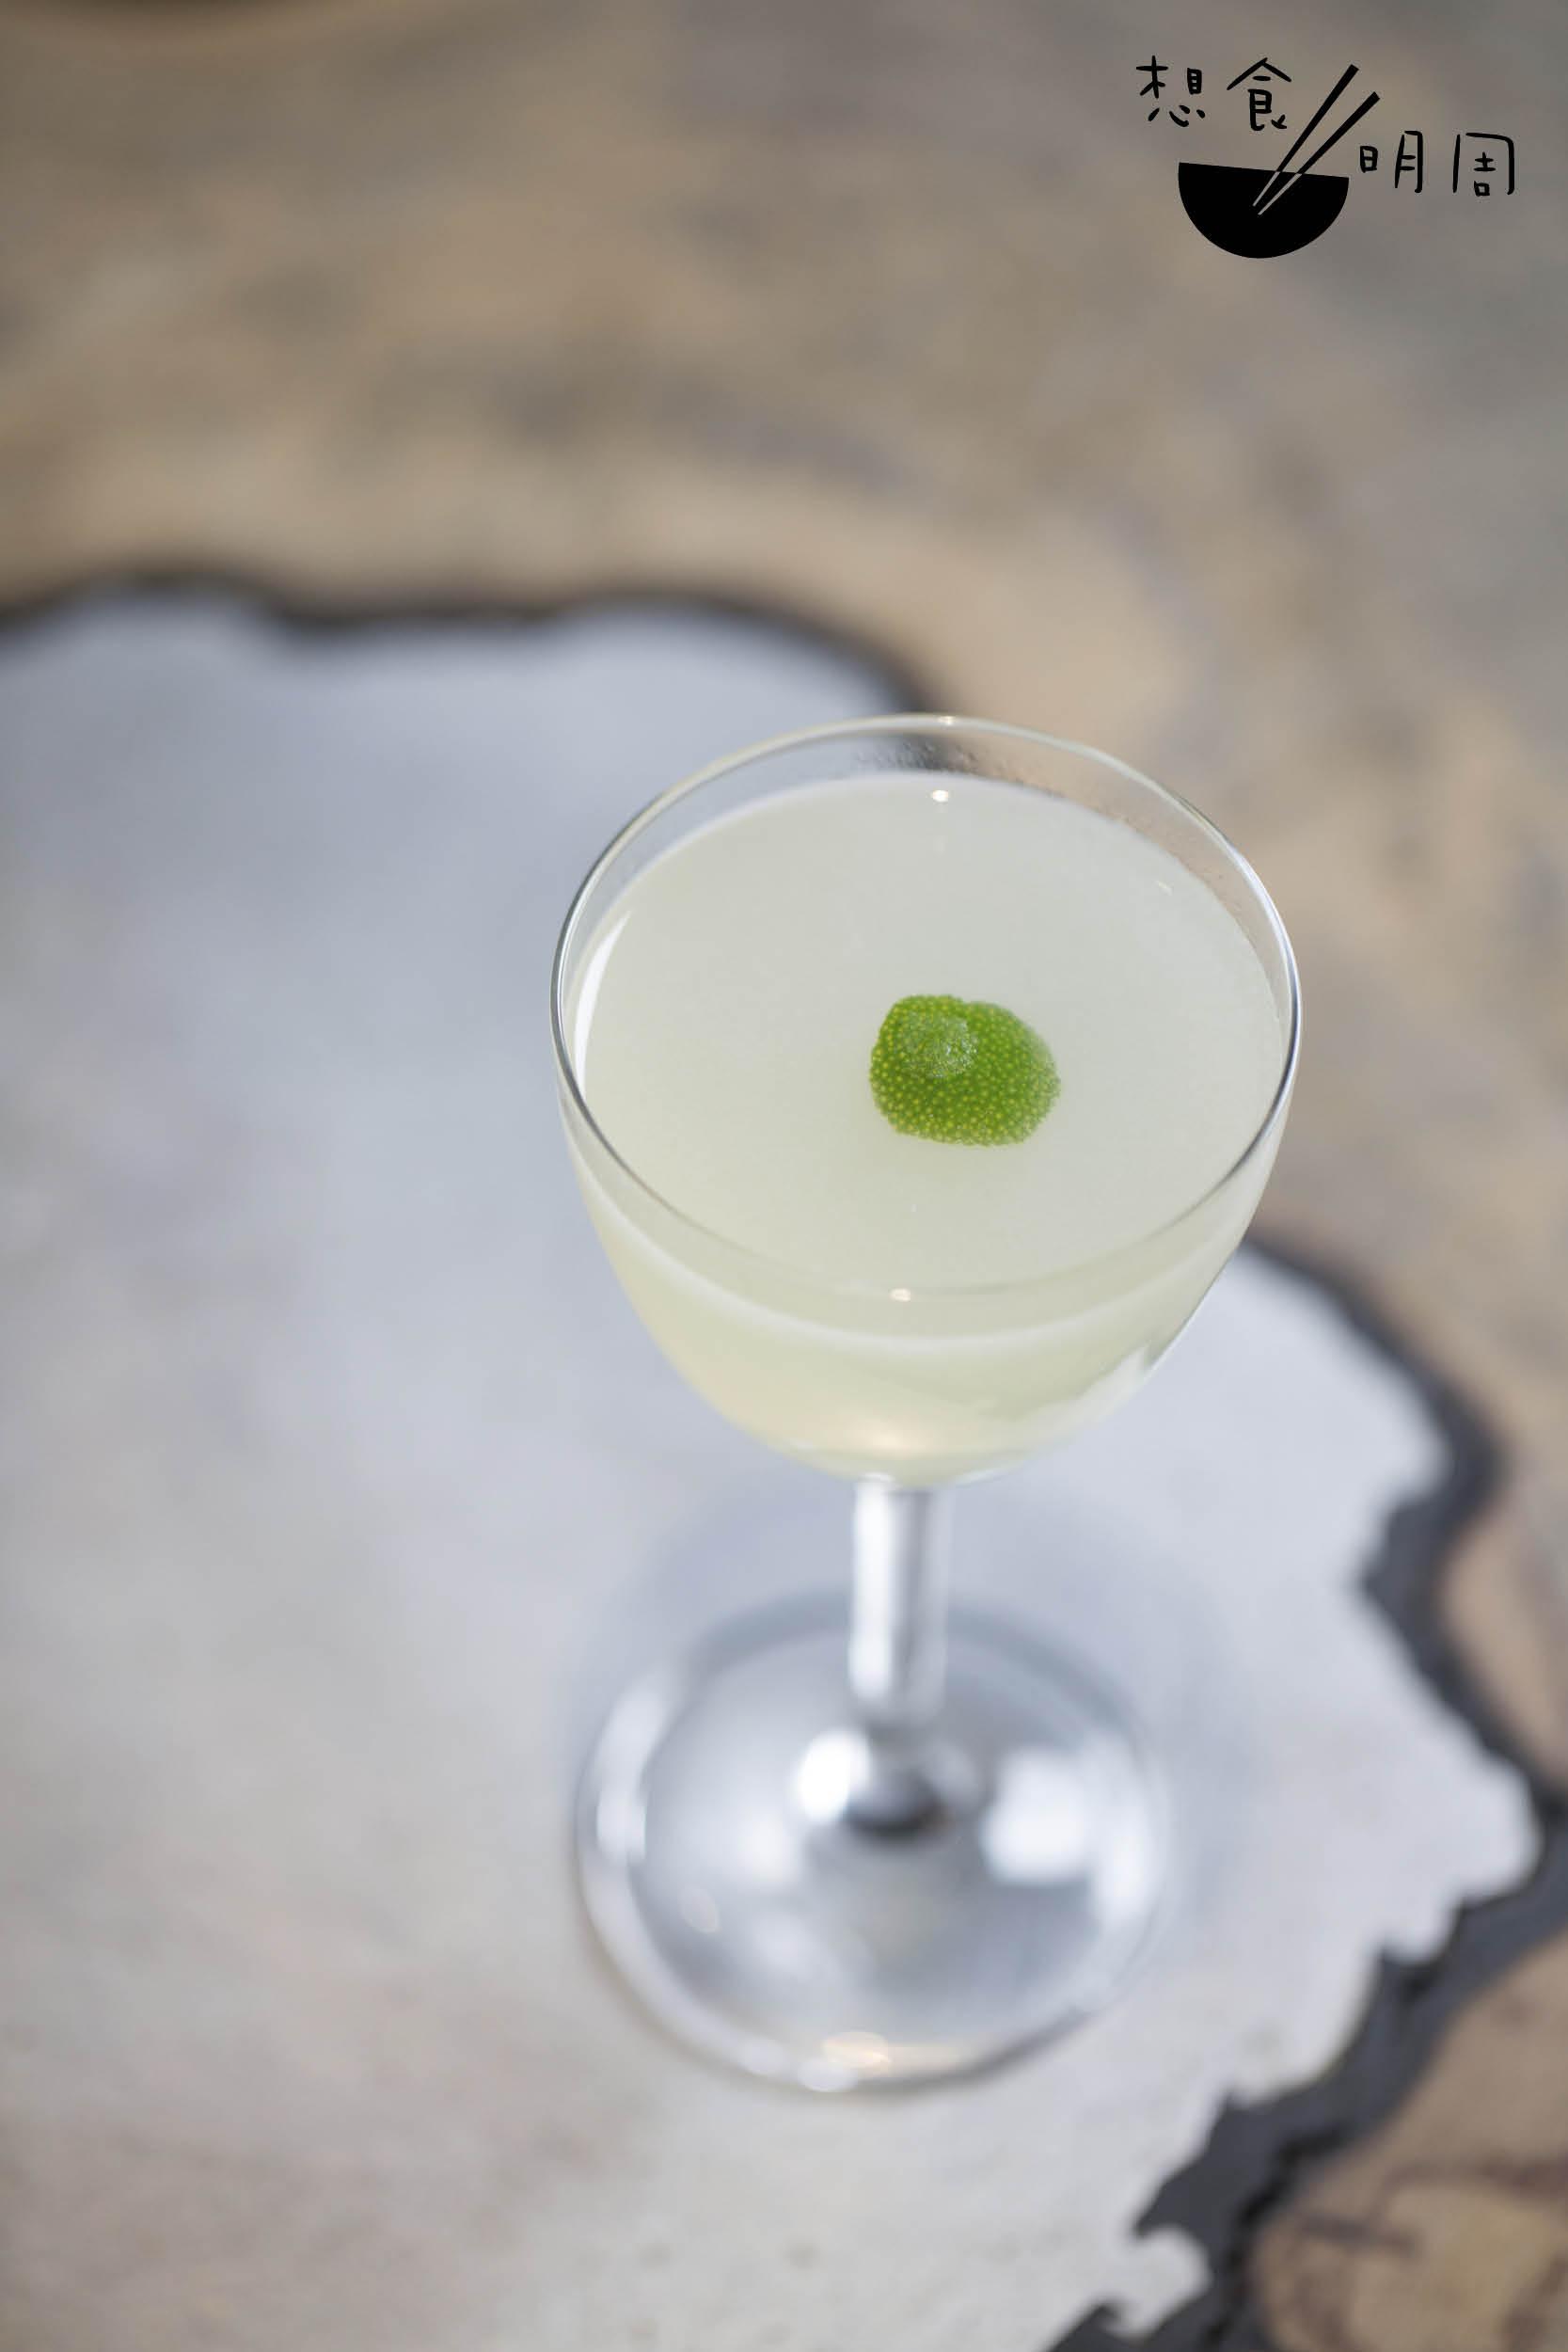 Gimlet // 幾乎每間酒吧都有售,是經典調酒之一,以氈酒、青 檸汁等調成。為了減少碳足跡(Carbon footprint), 酒吧特地選用本地蒸餾廠無名氏(N.I.P.)的出品, 並盡量選用在地的青檸。($120)